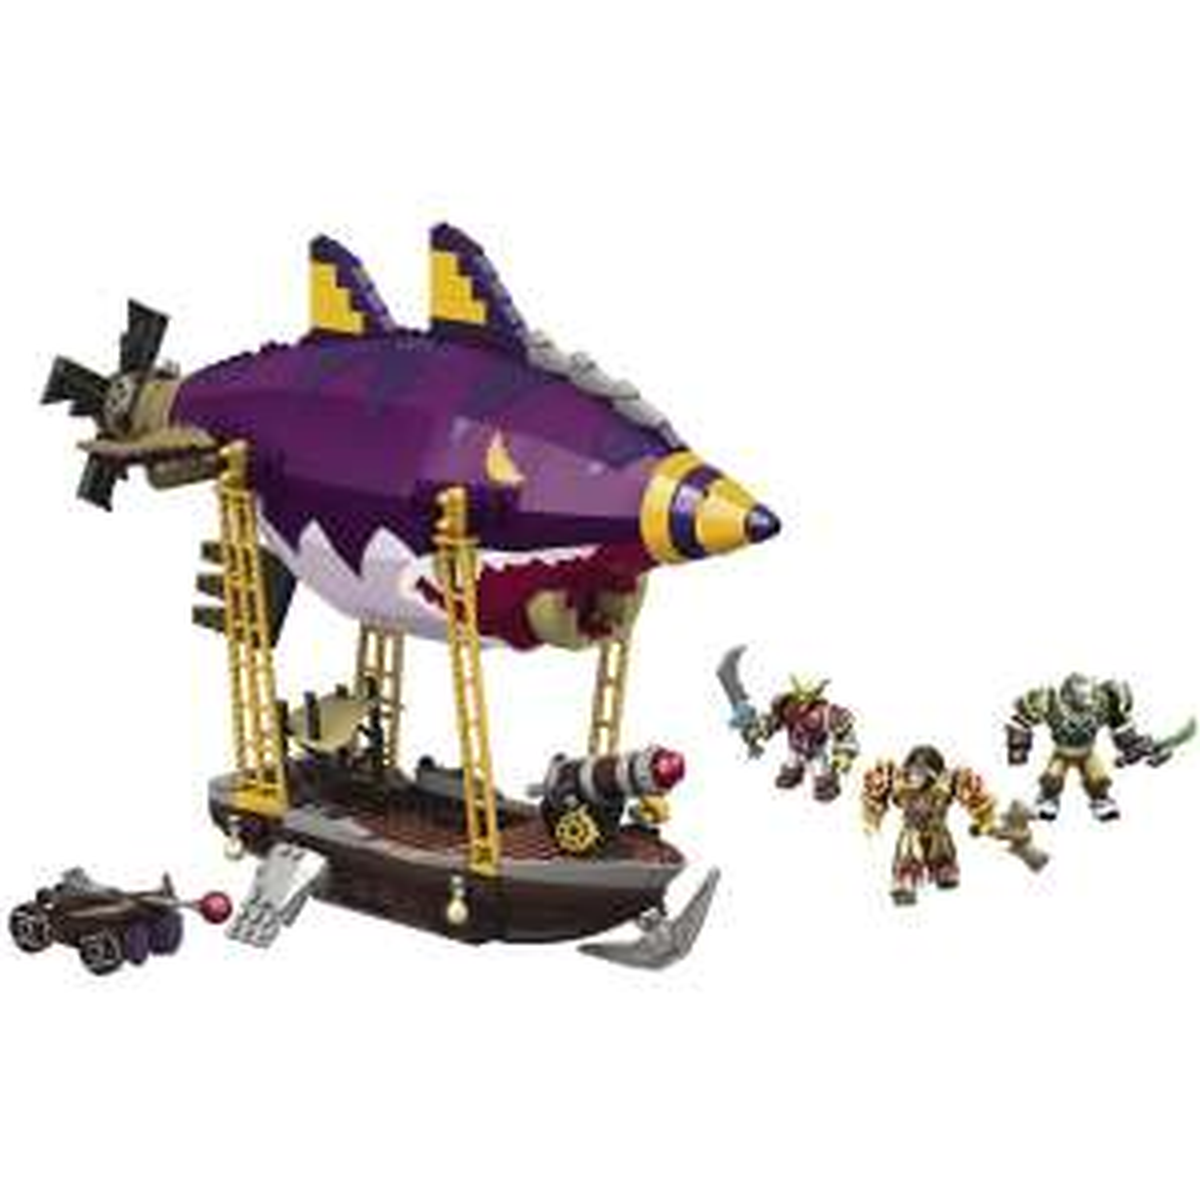 Jeu de construction Megabloks - World of Warcraft : Embuscade de Zeppelin Gobelin